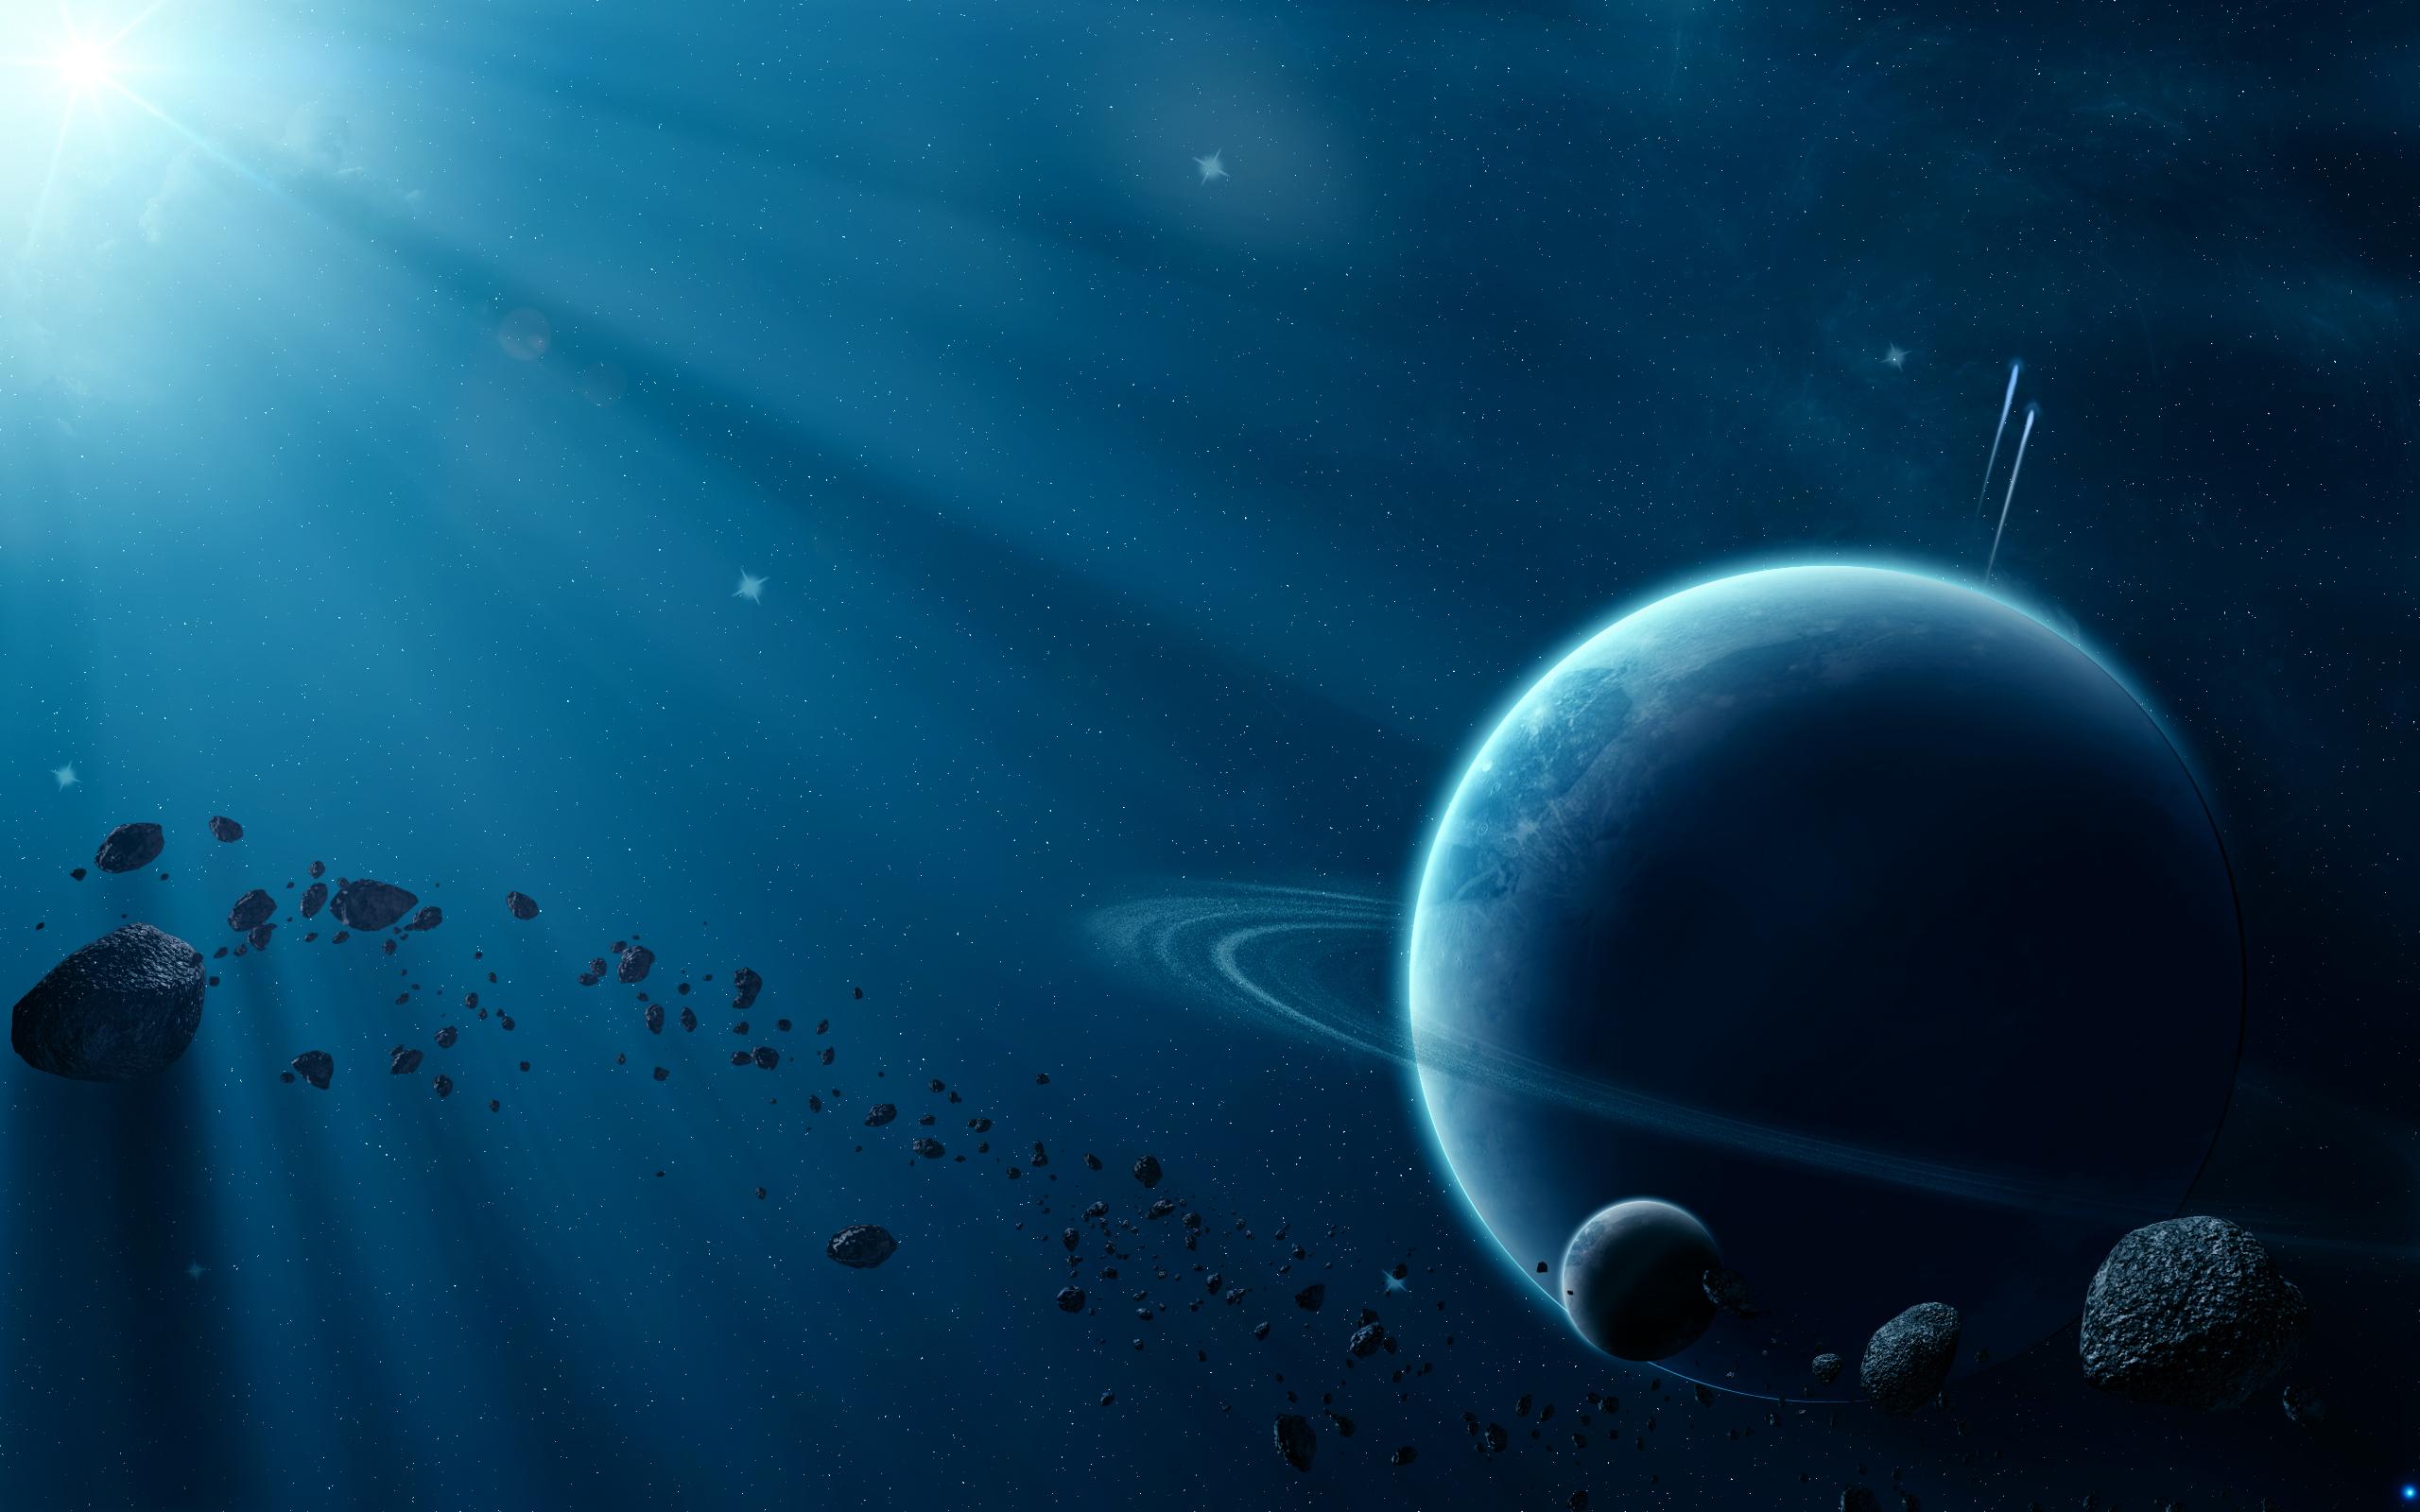 звезда освещает планету, метеориты, астероиды